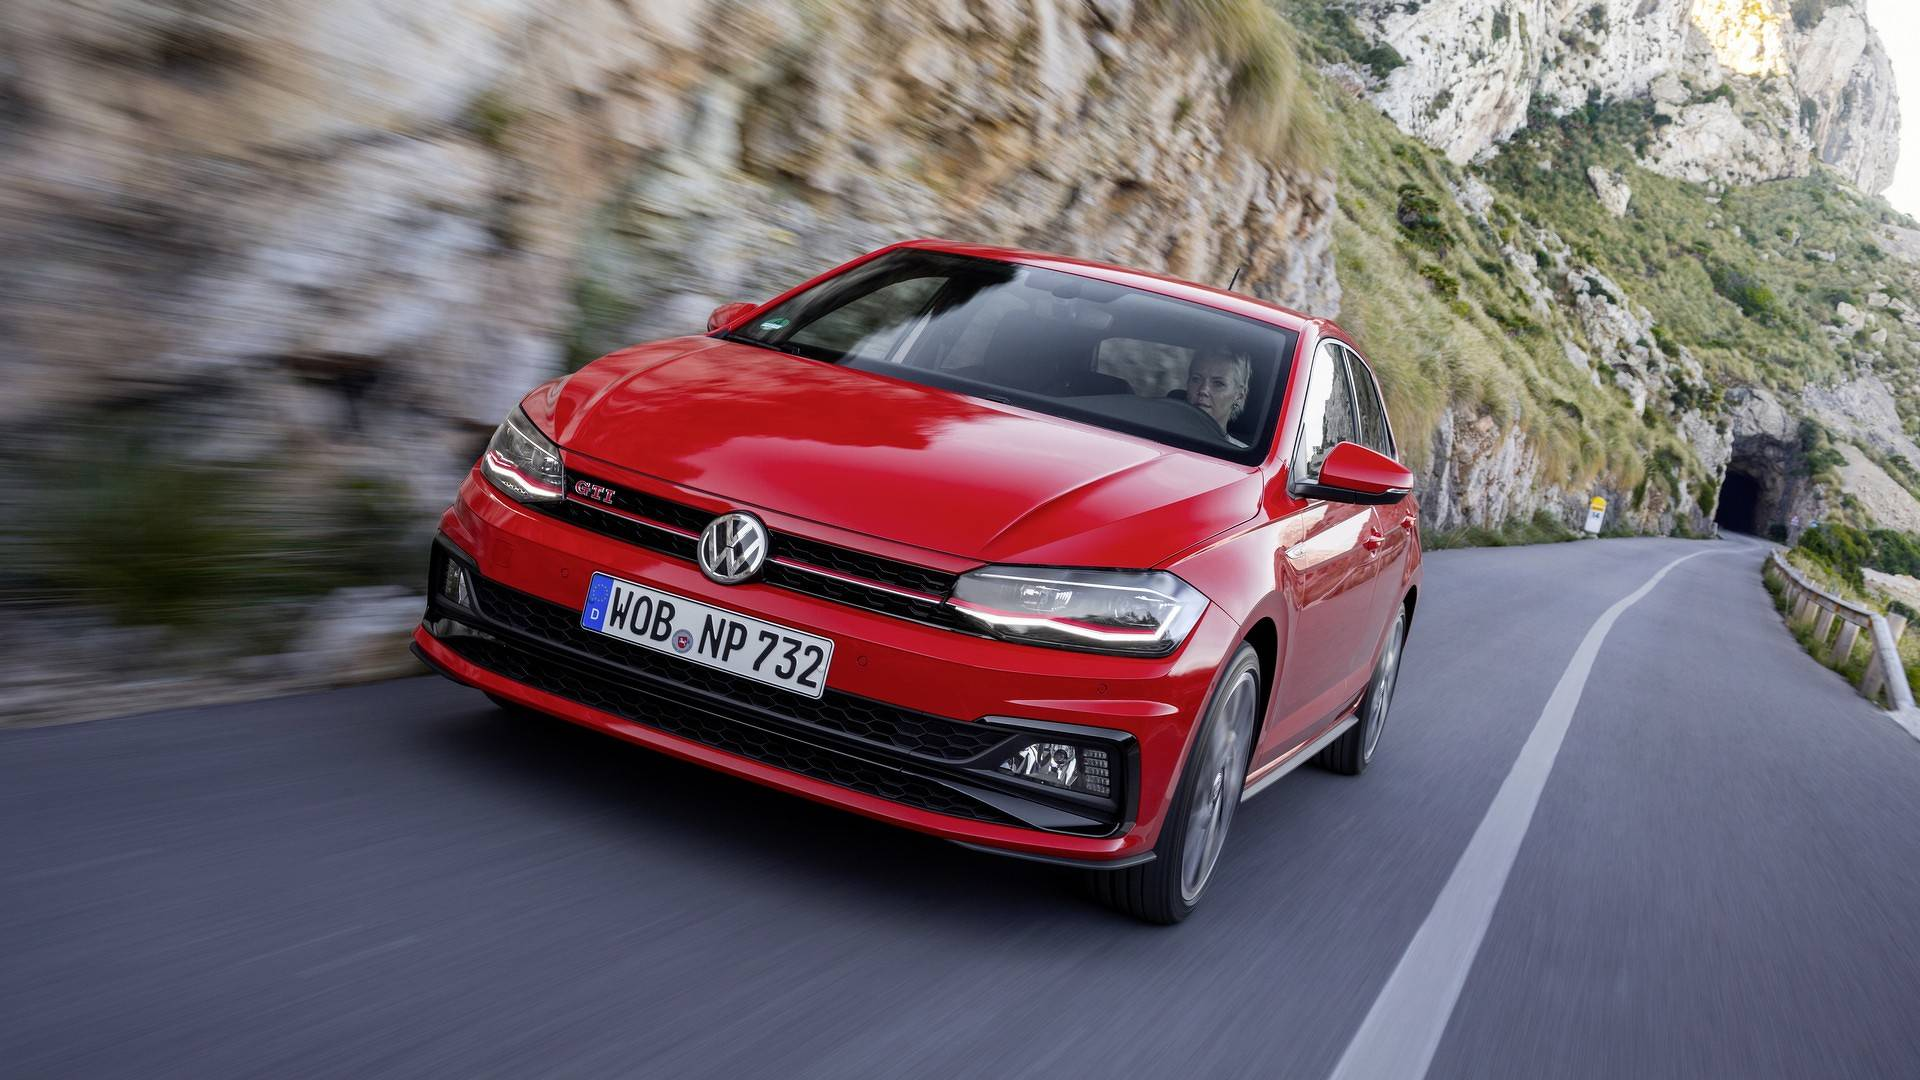 Volkswagen Polo GTI do 100 km/h ubrzava brže nego što to fabrika tvrdi (video)